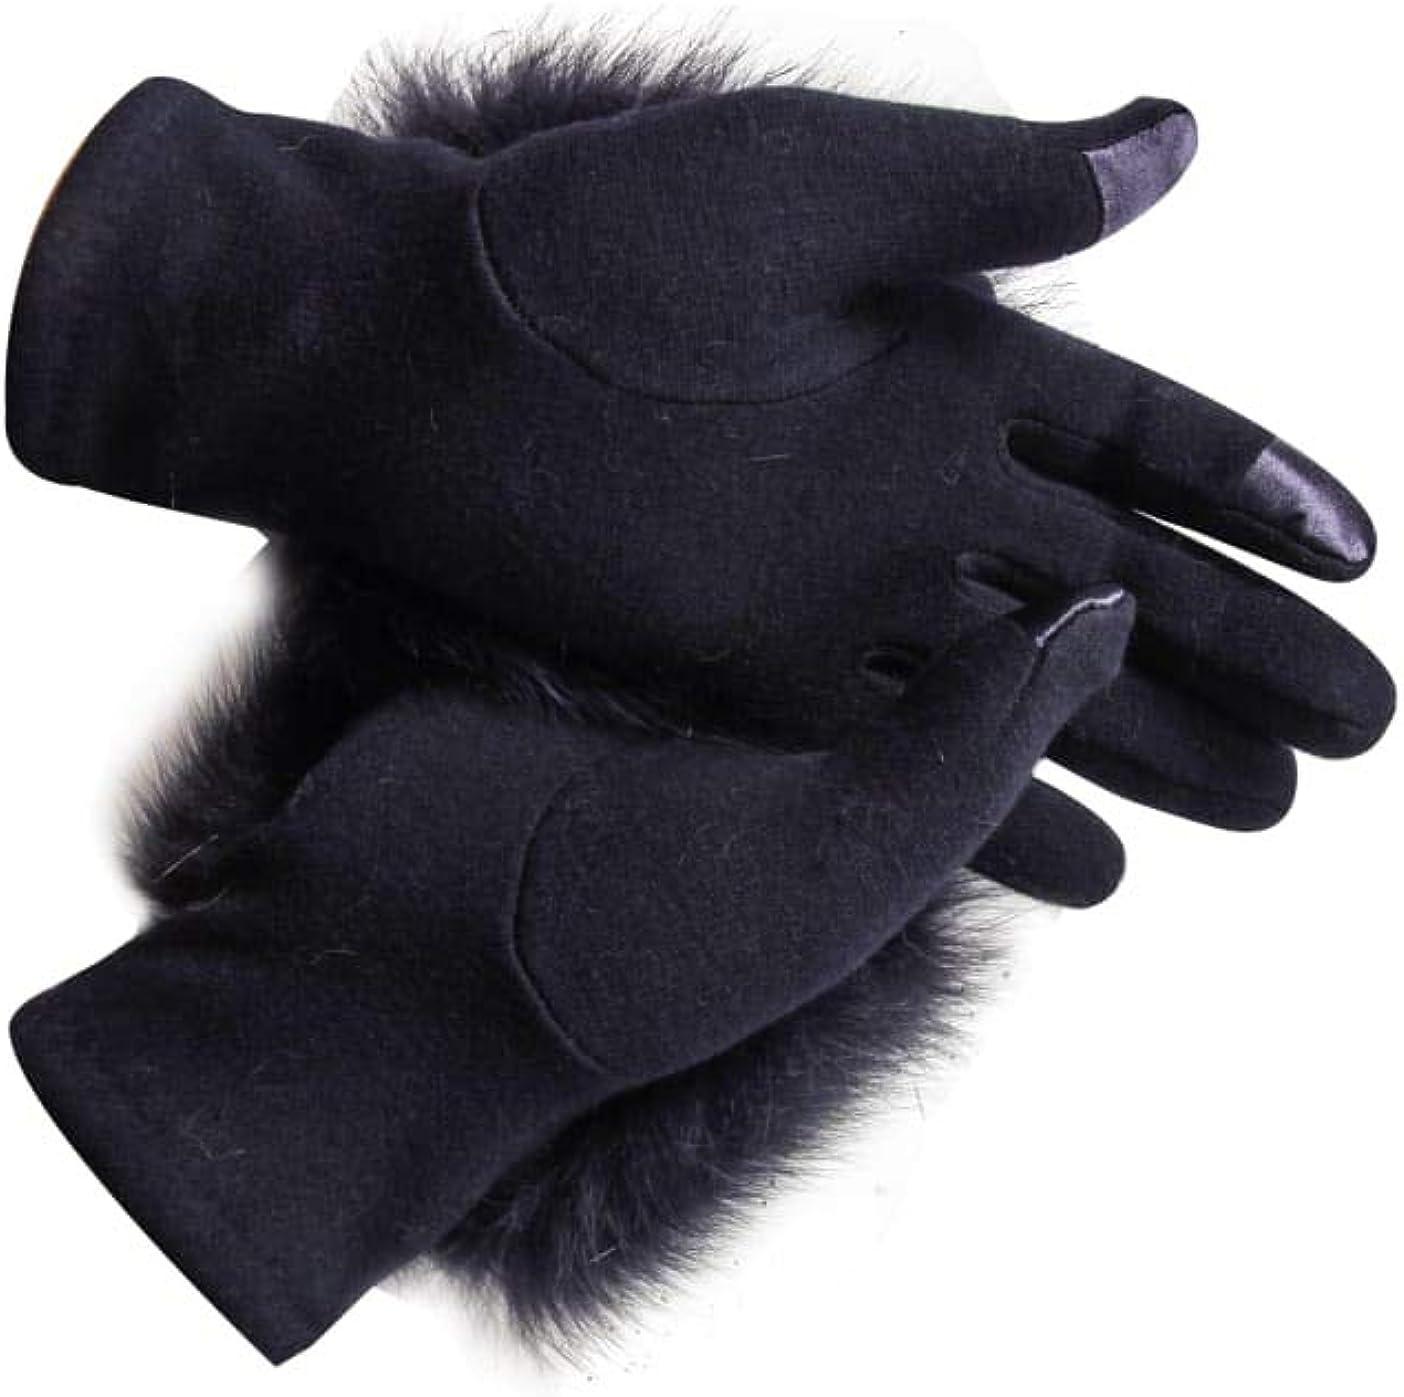 Fashion Touch Screen Winter Gloves with Fluffy Genuine Fox Fur Cuff Splicing Fleece Lining